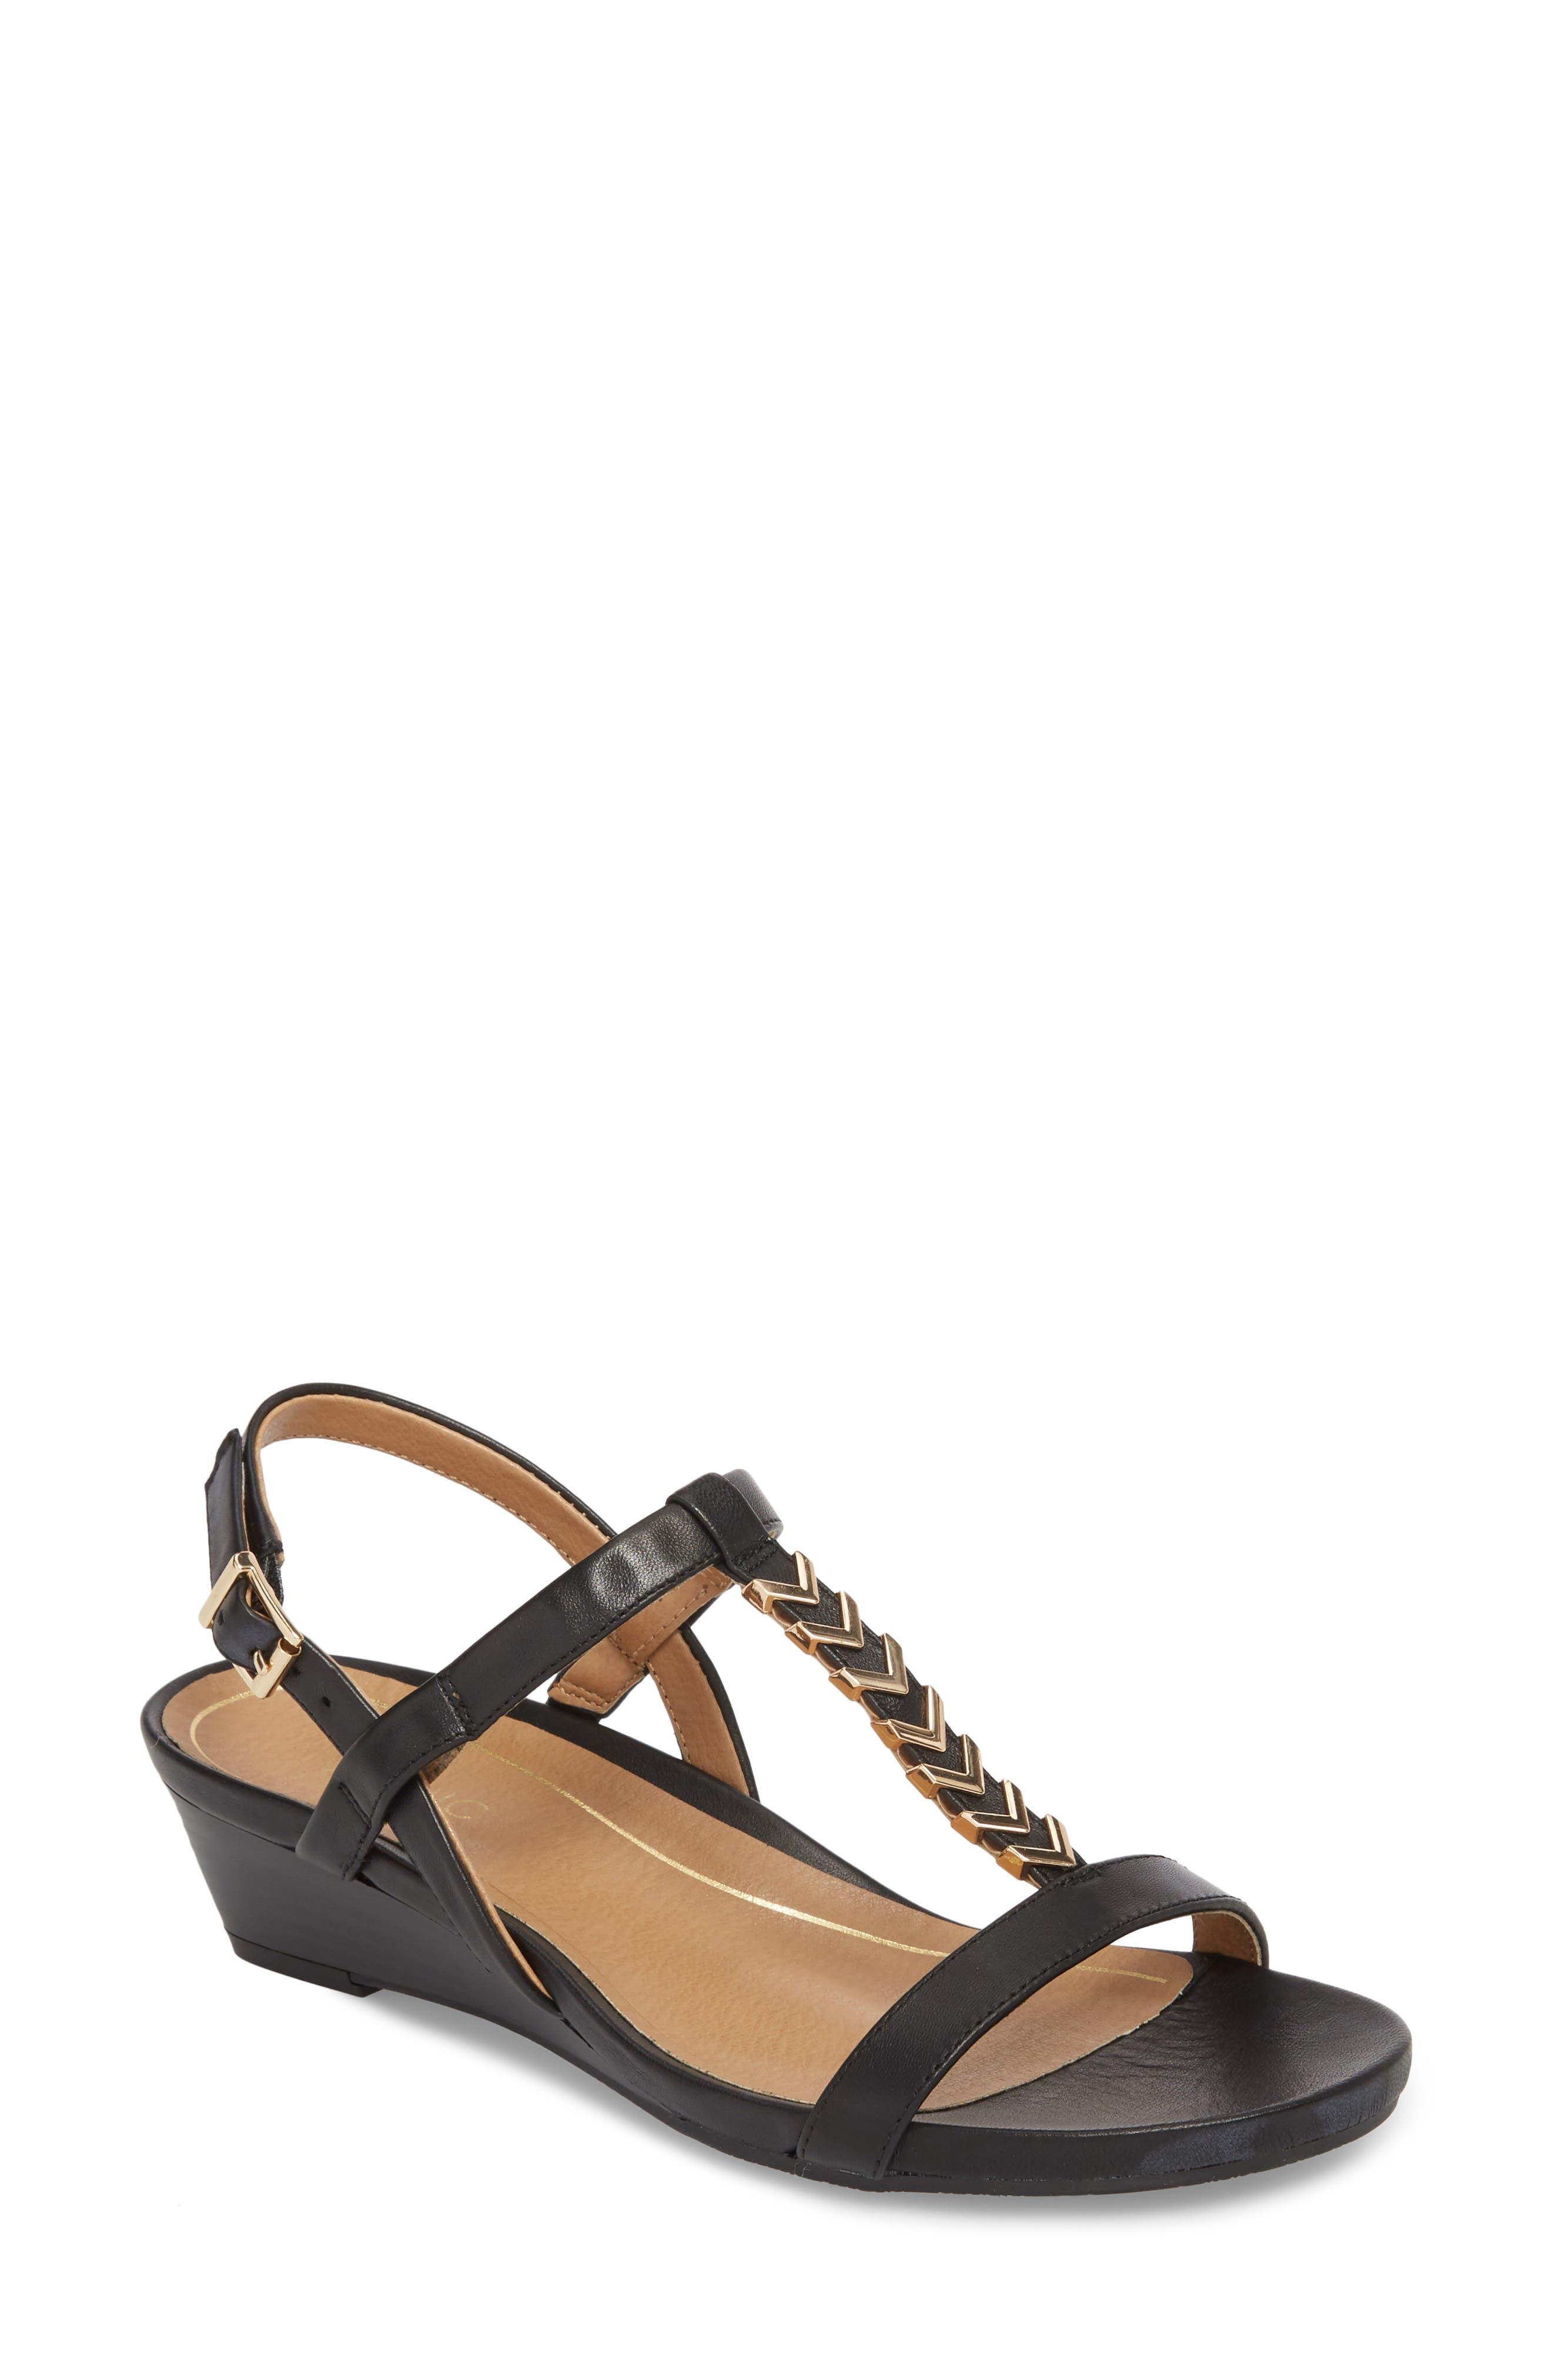 VIONIC Cali T-Strap Wedge Sandal, Main, color, 001